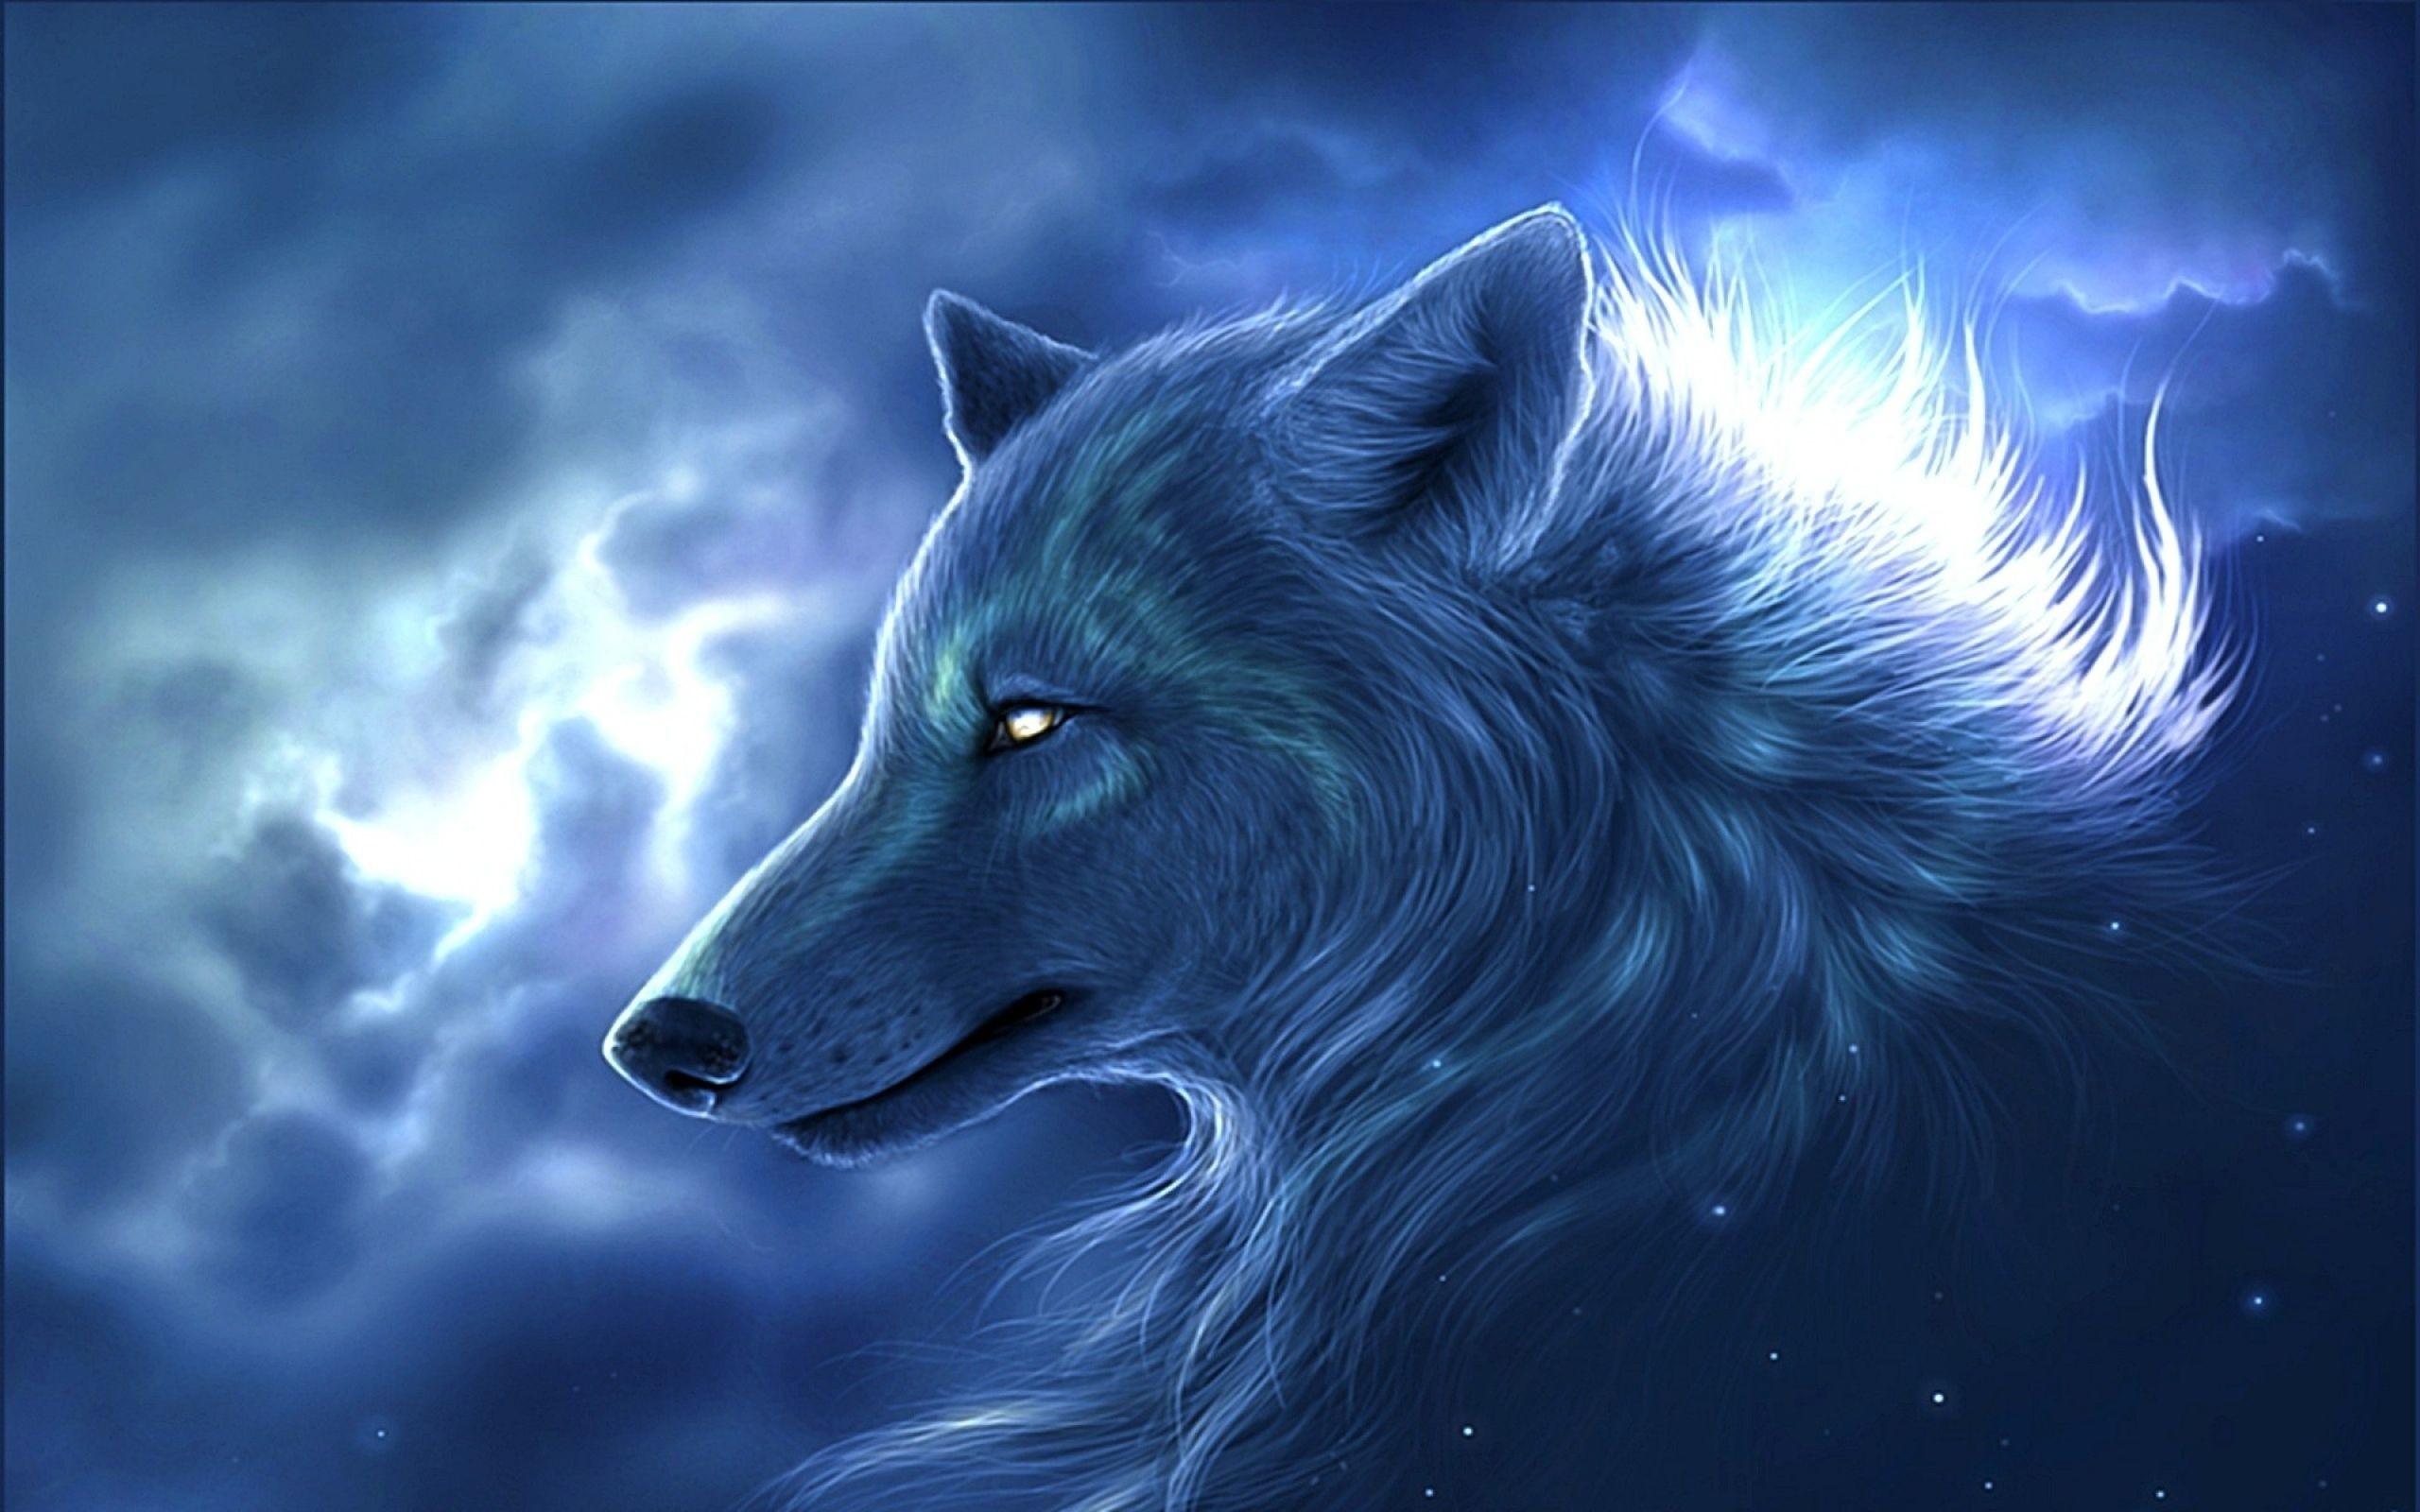 Fantasy-Wolf-Wallpaper-HD.jpg